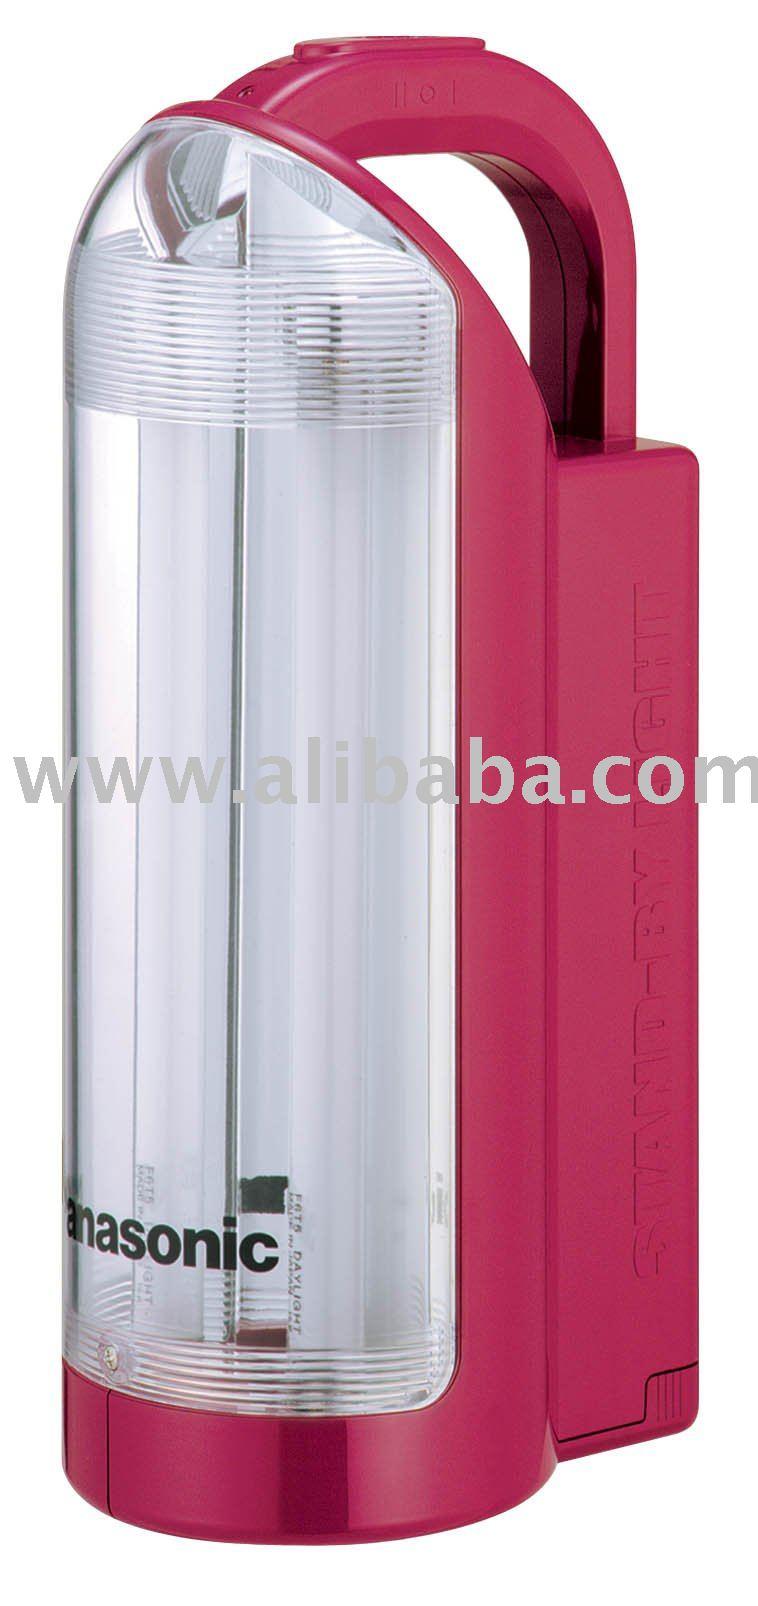 Panasonic Emergency Lamp (sqt-710r) - Buy Rechargeable Lamp Product ... for emergency lamp panasonic  157uhy